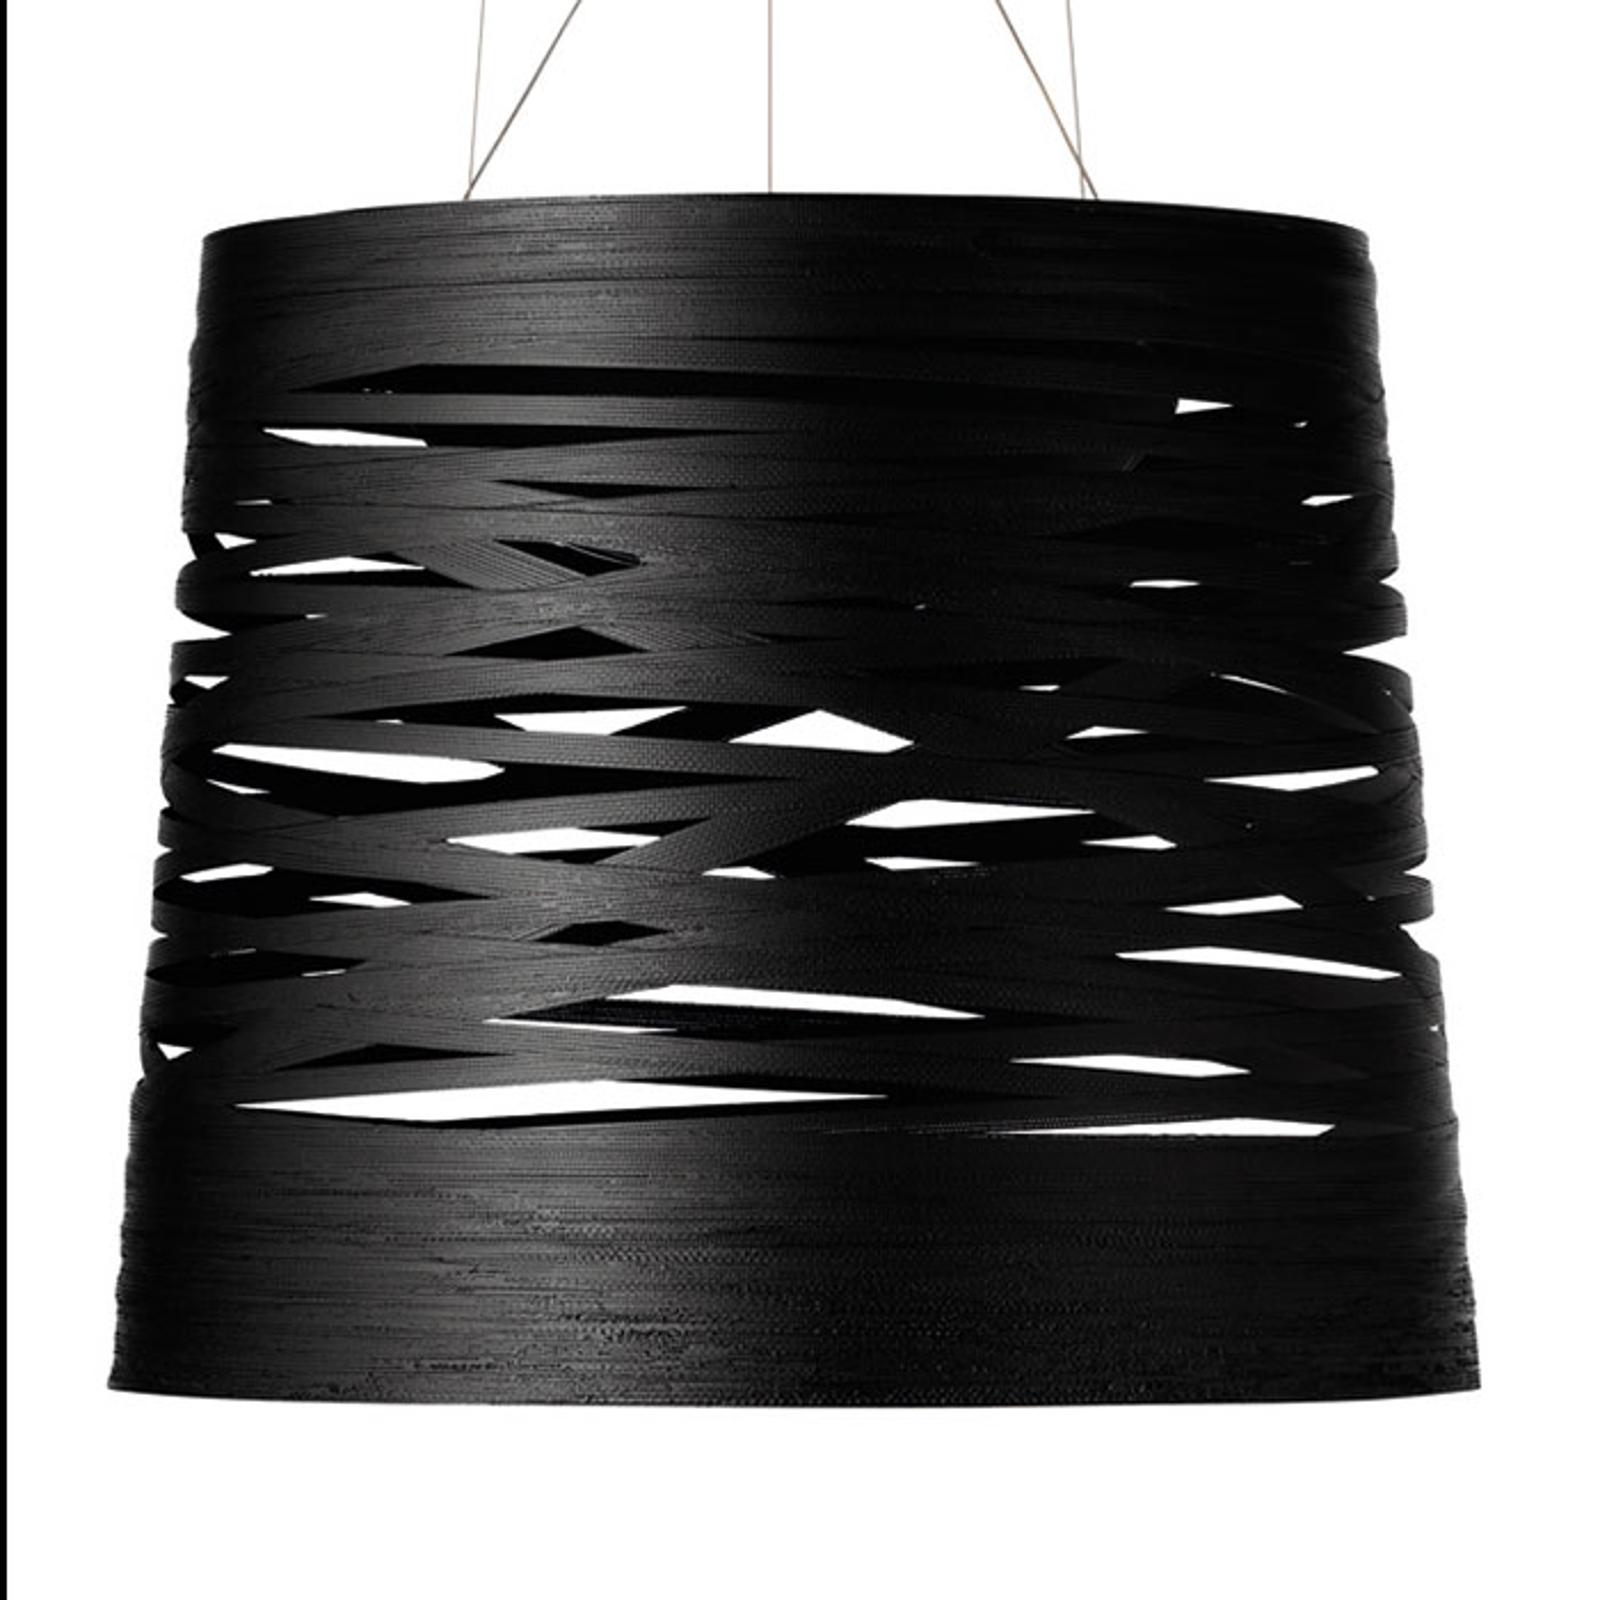 Foscarini Tress grande LED-Hängeleuchte, schwarz